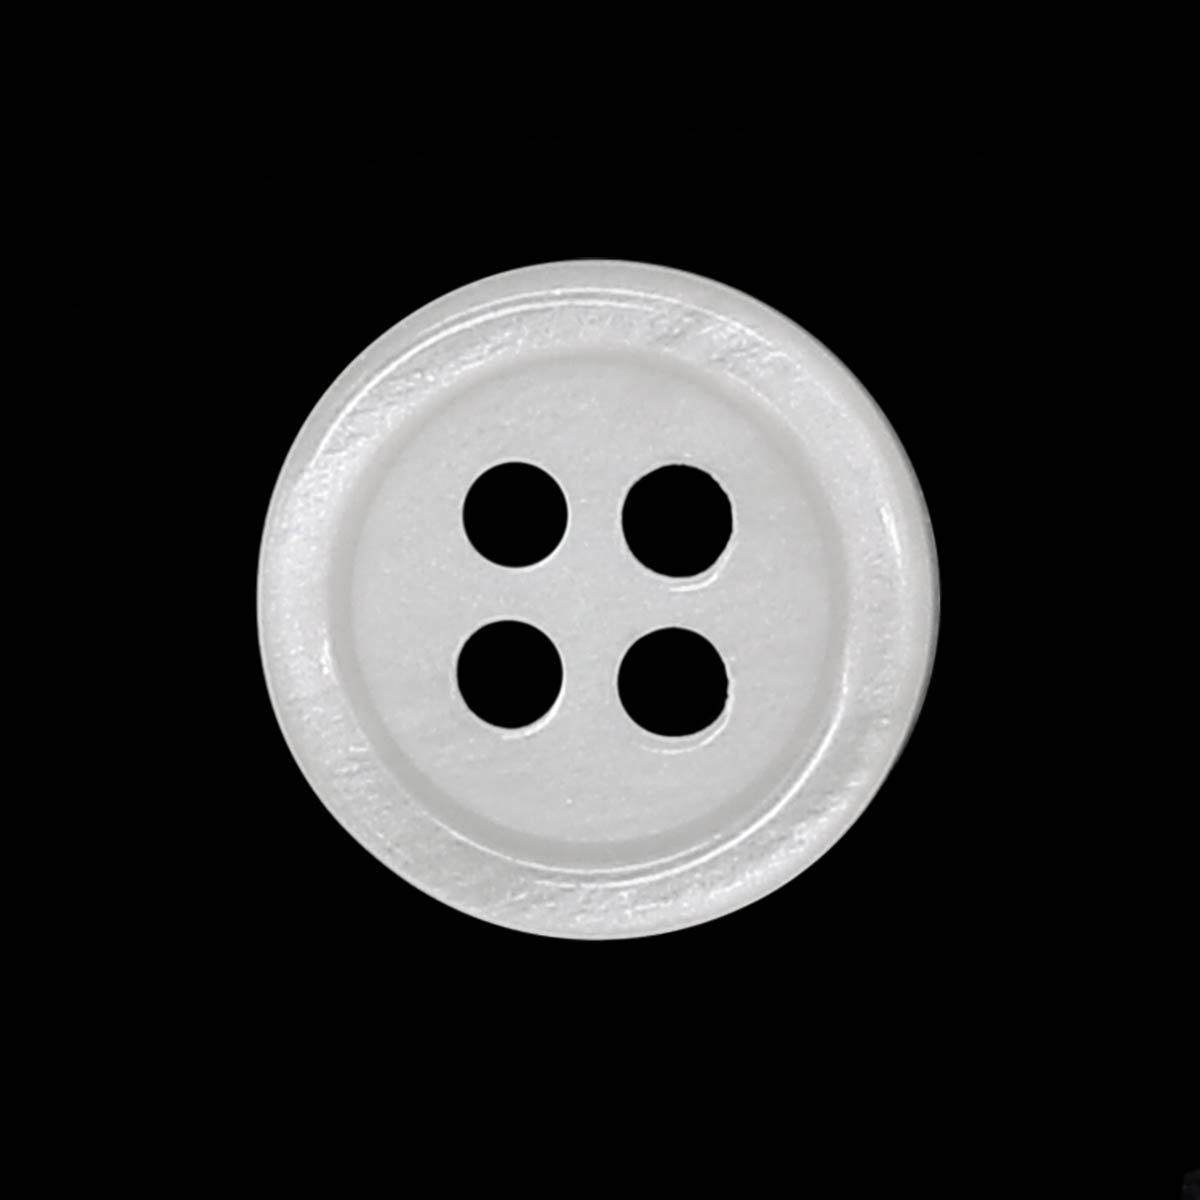 35483/4 18 (3512) Пуговица 4прокола бел.глянц.полиэстер